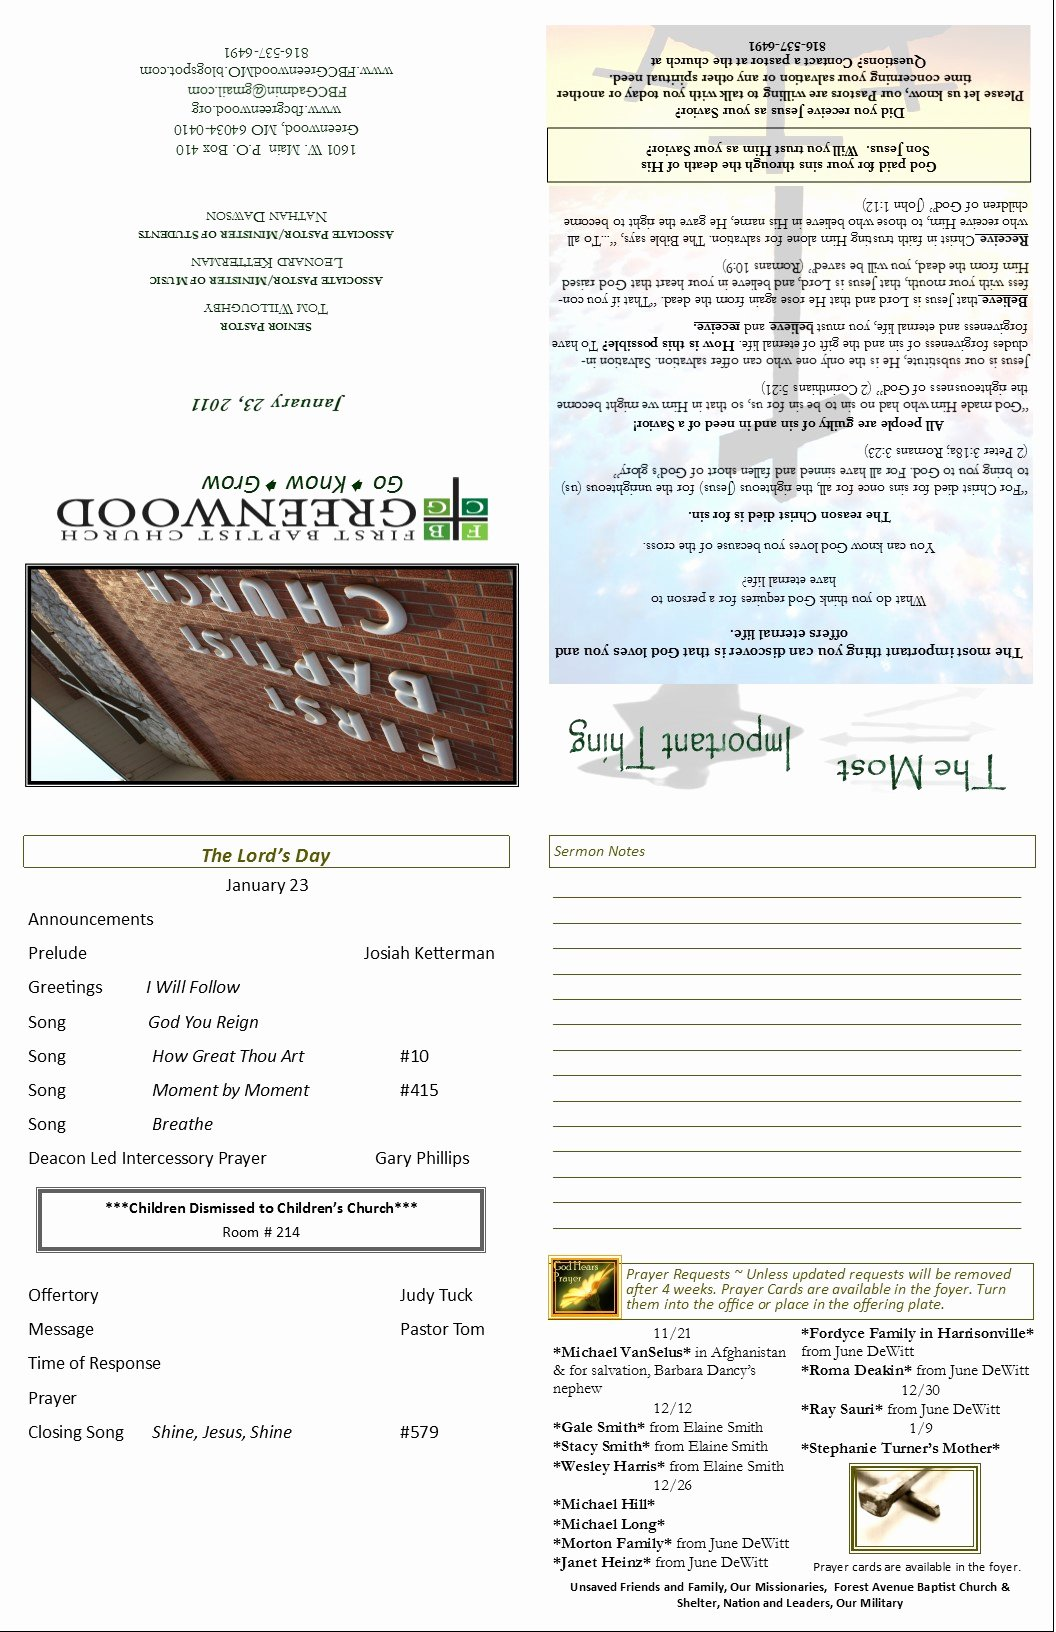 Church Bulletin Templates Free New Church Bulletin Template